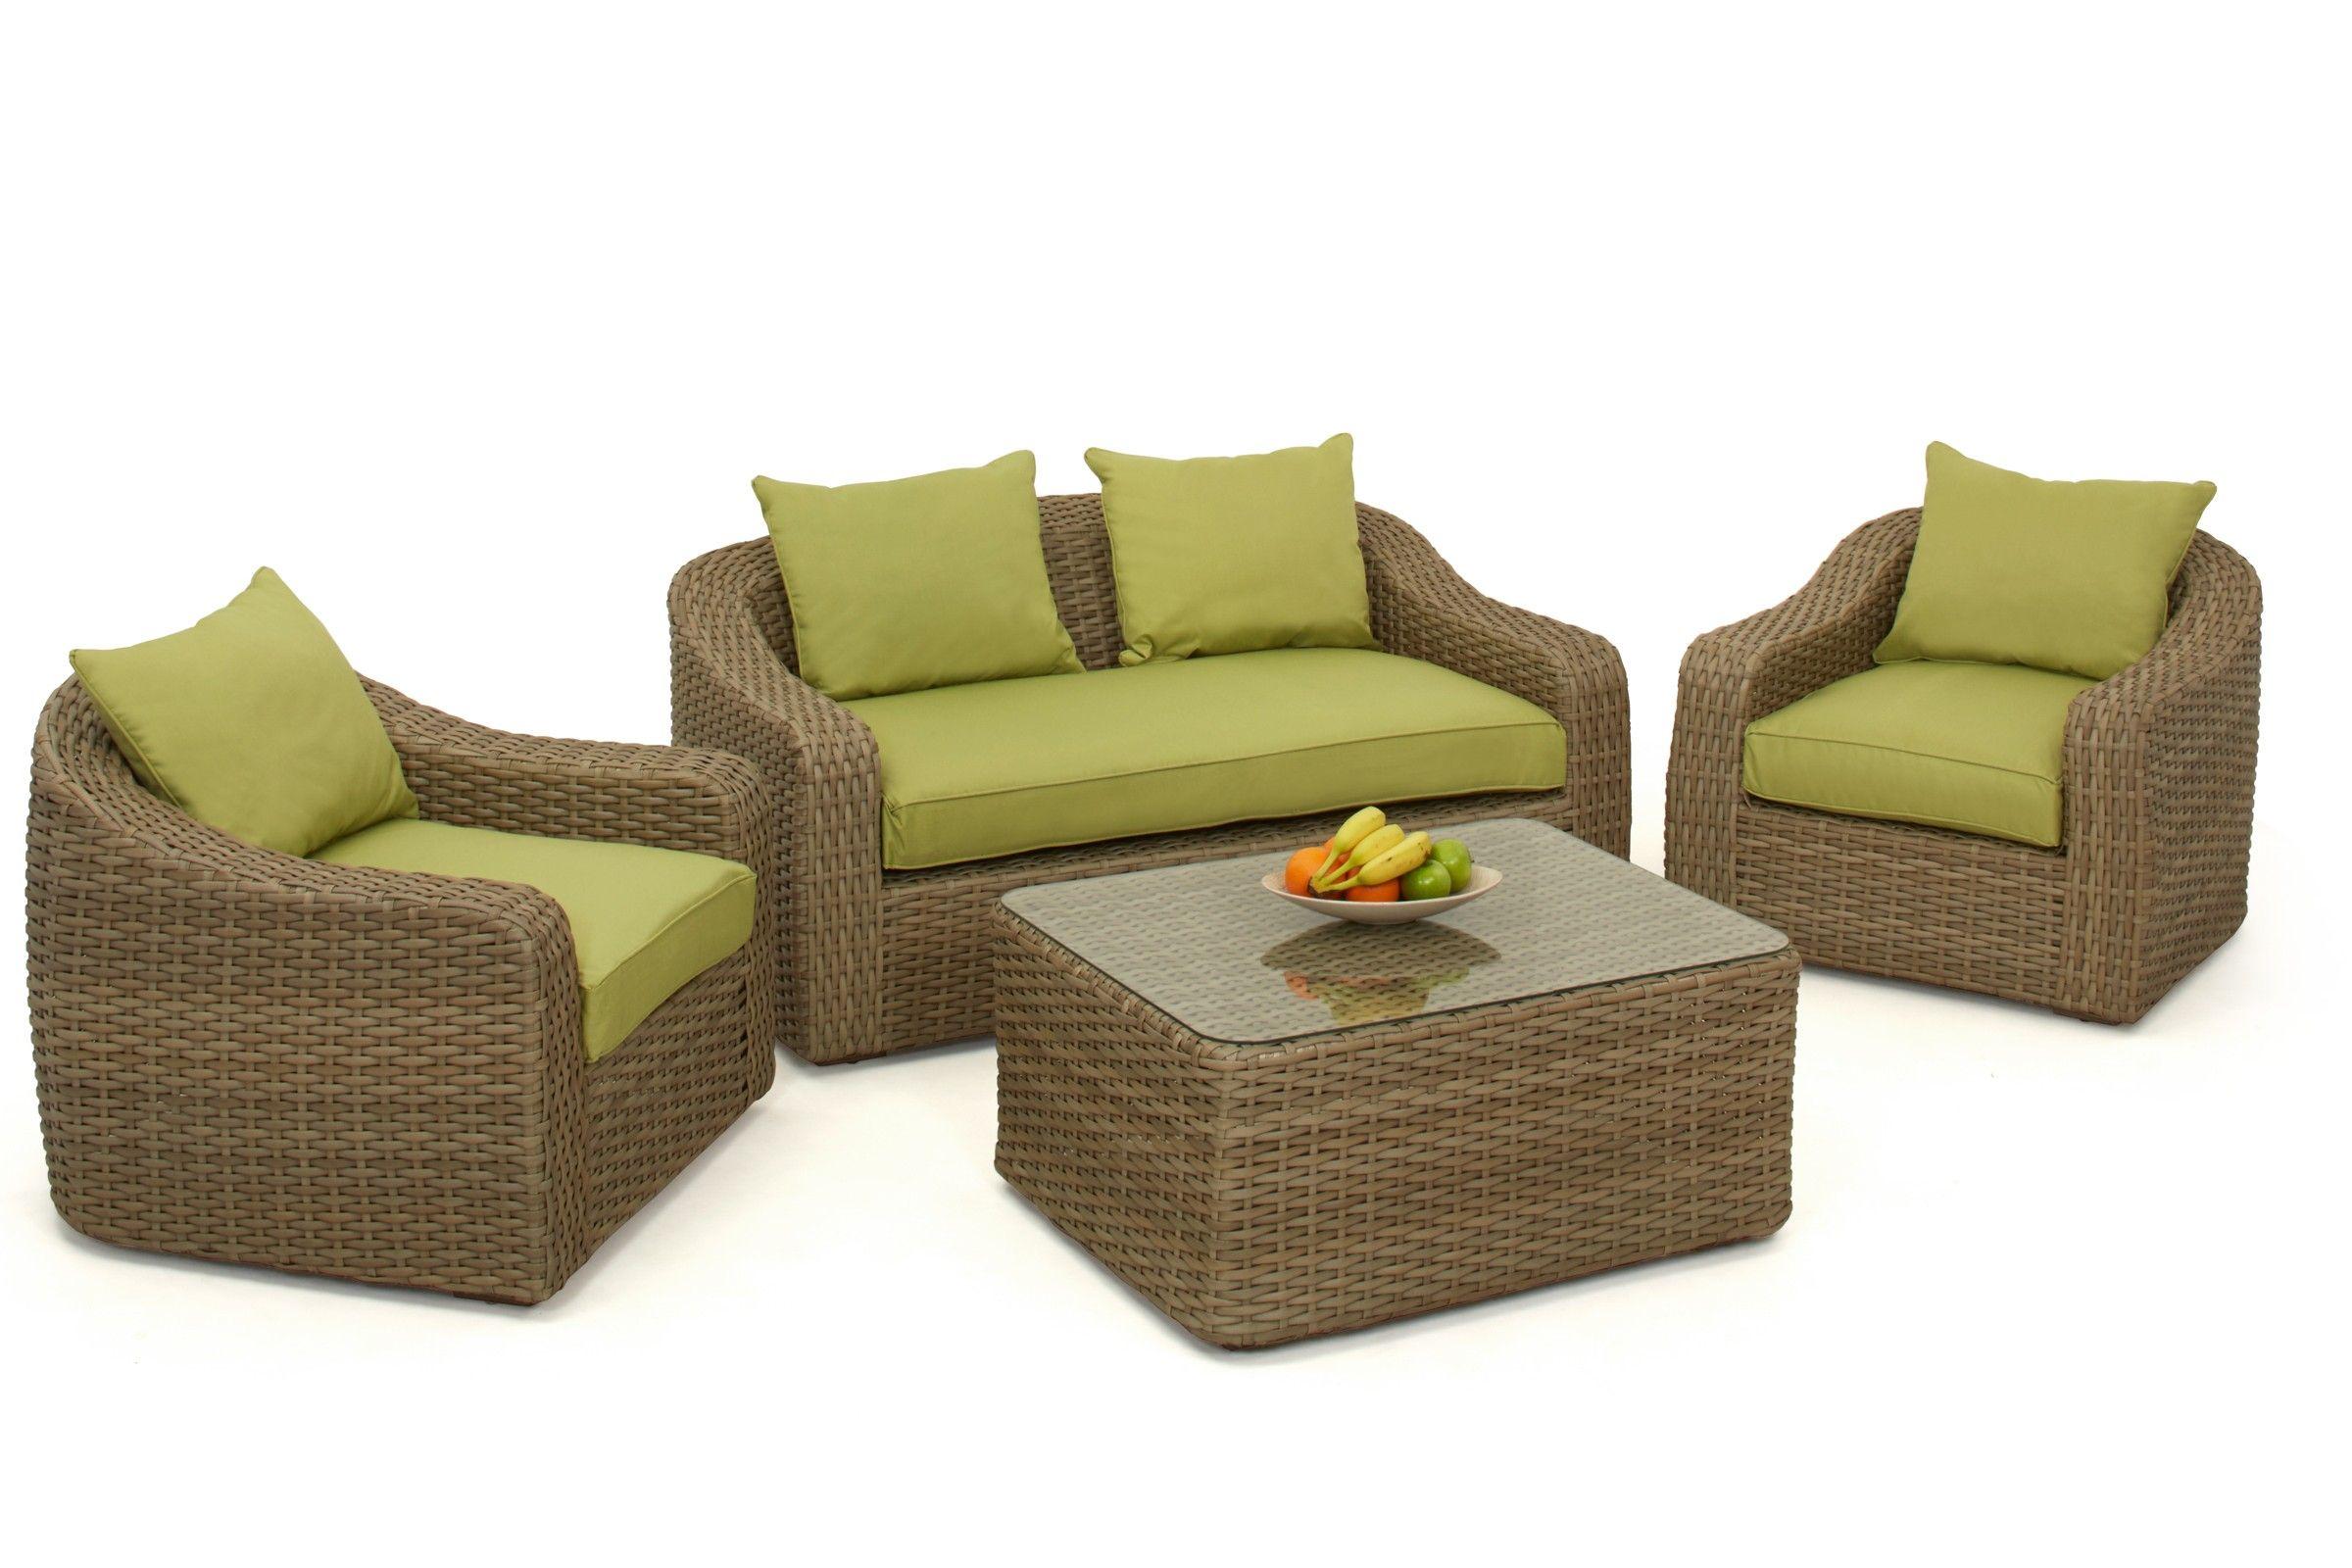 cool fice Furniture Sofa Luxury fice Furniture Sofa 51